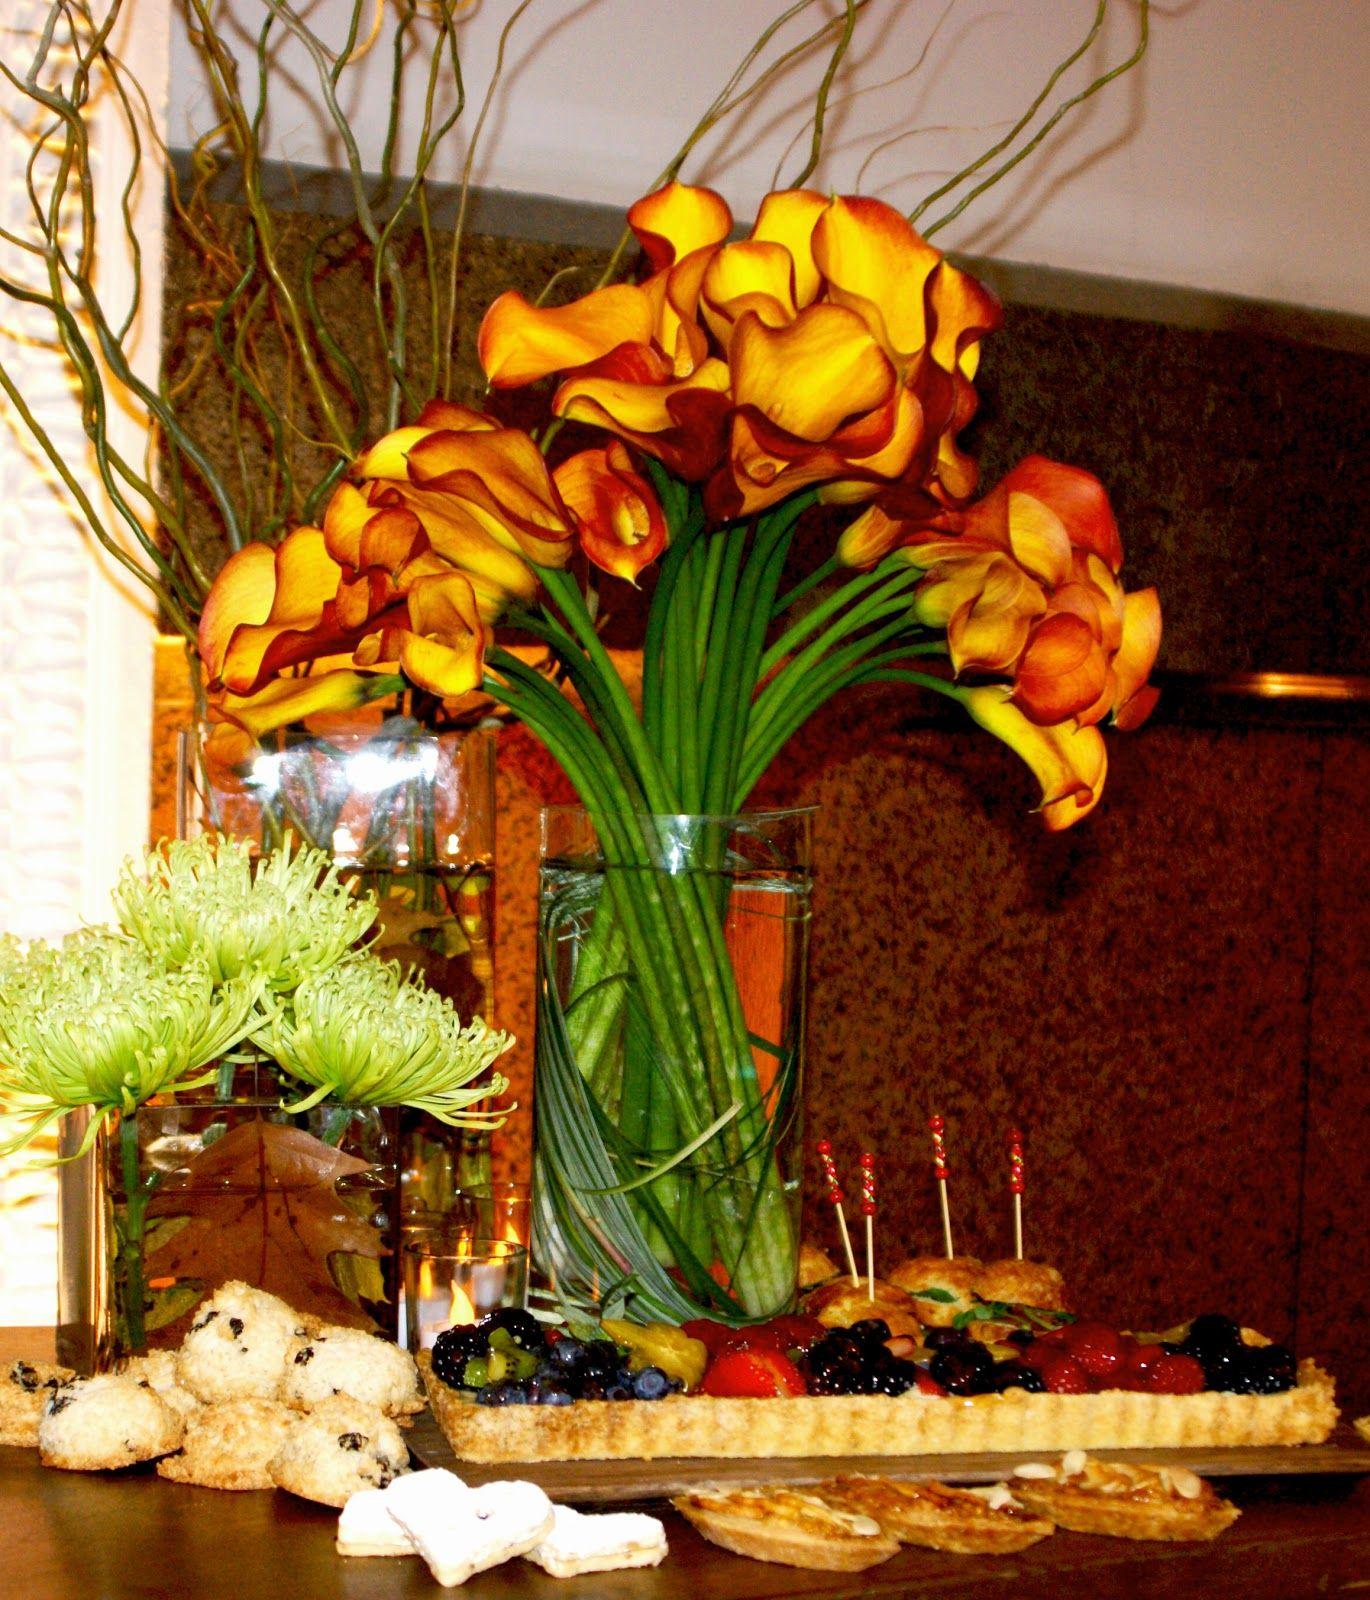 West collects philadelphia reception flower arrangement of cala west collects philadelphia reception flower arrangement of cala lily and spider mum by leslie grayson izmirmasajfo